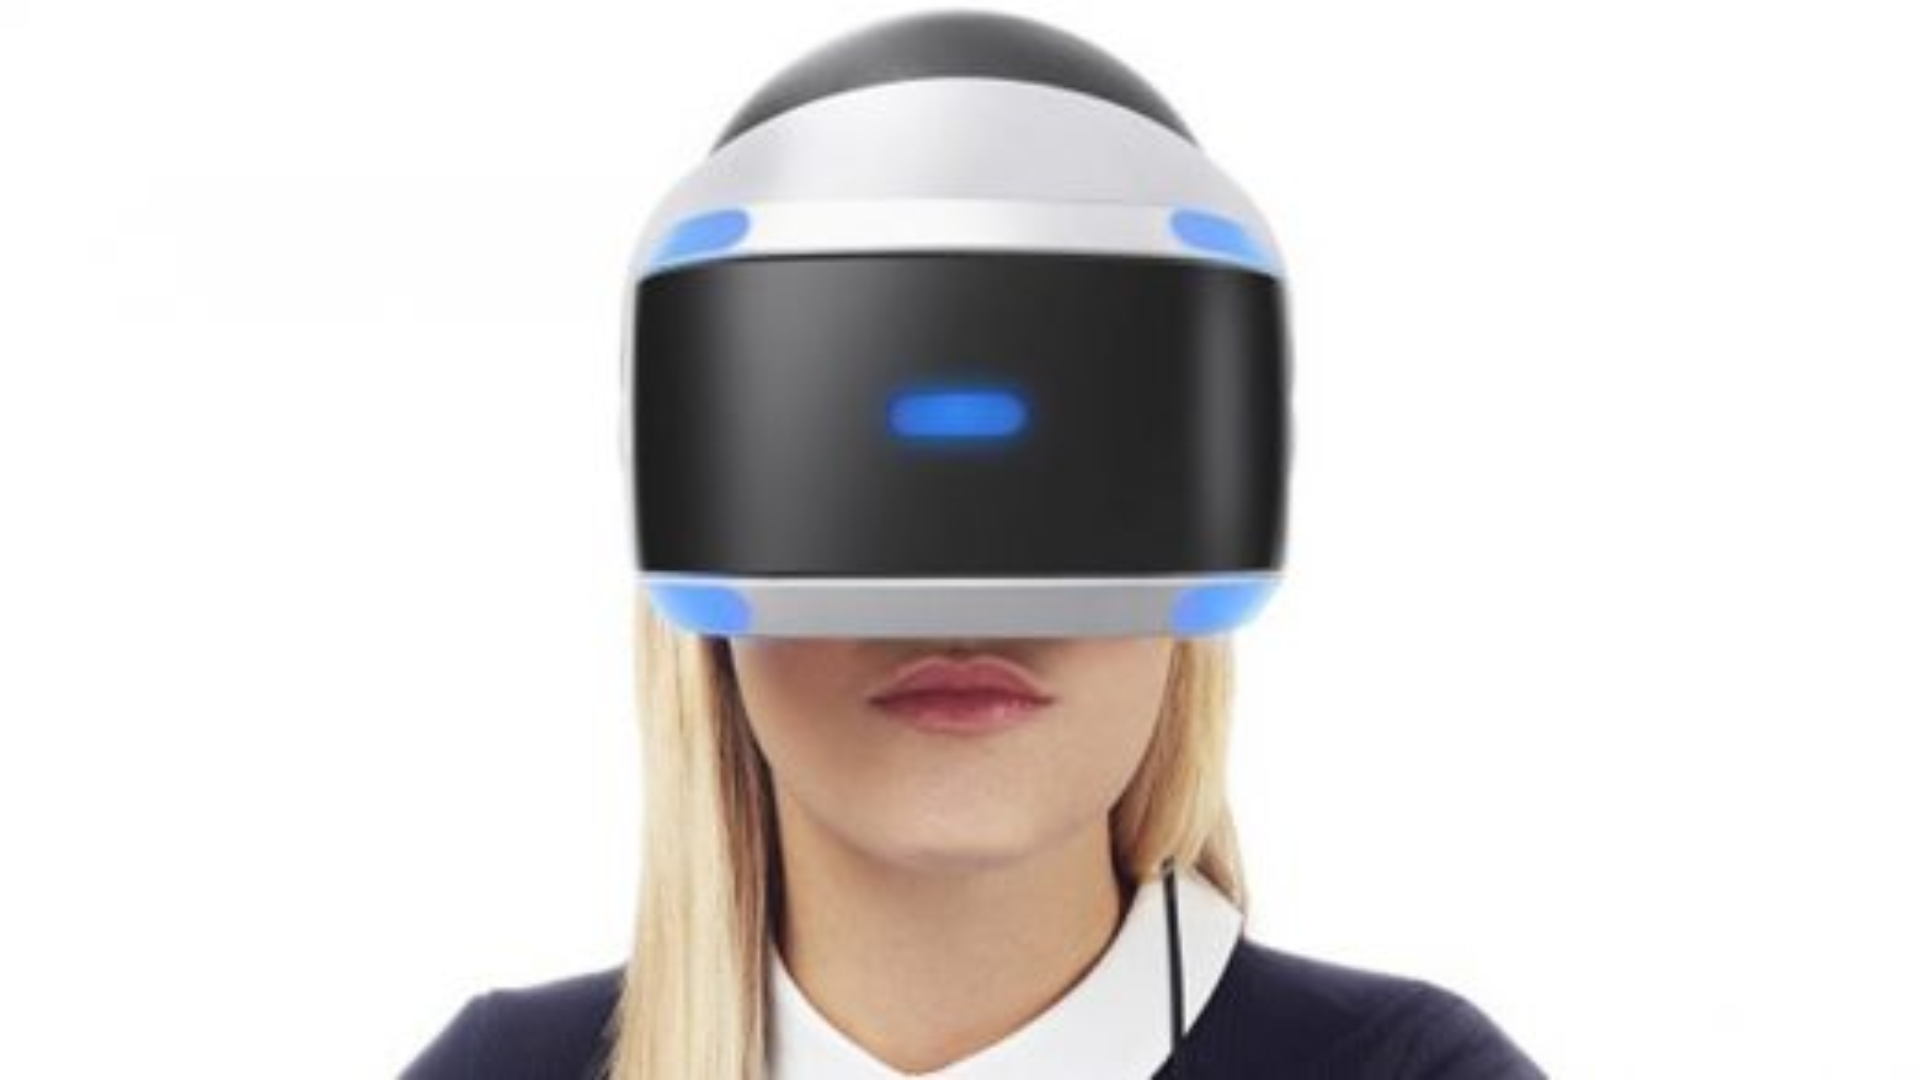 واقعیت مجازی | تگ